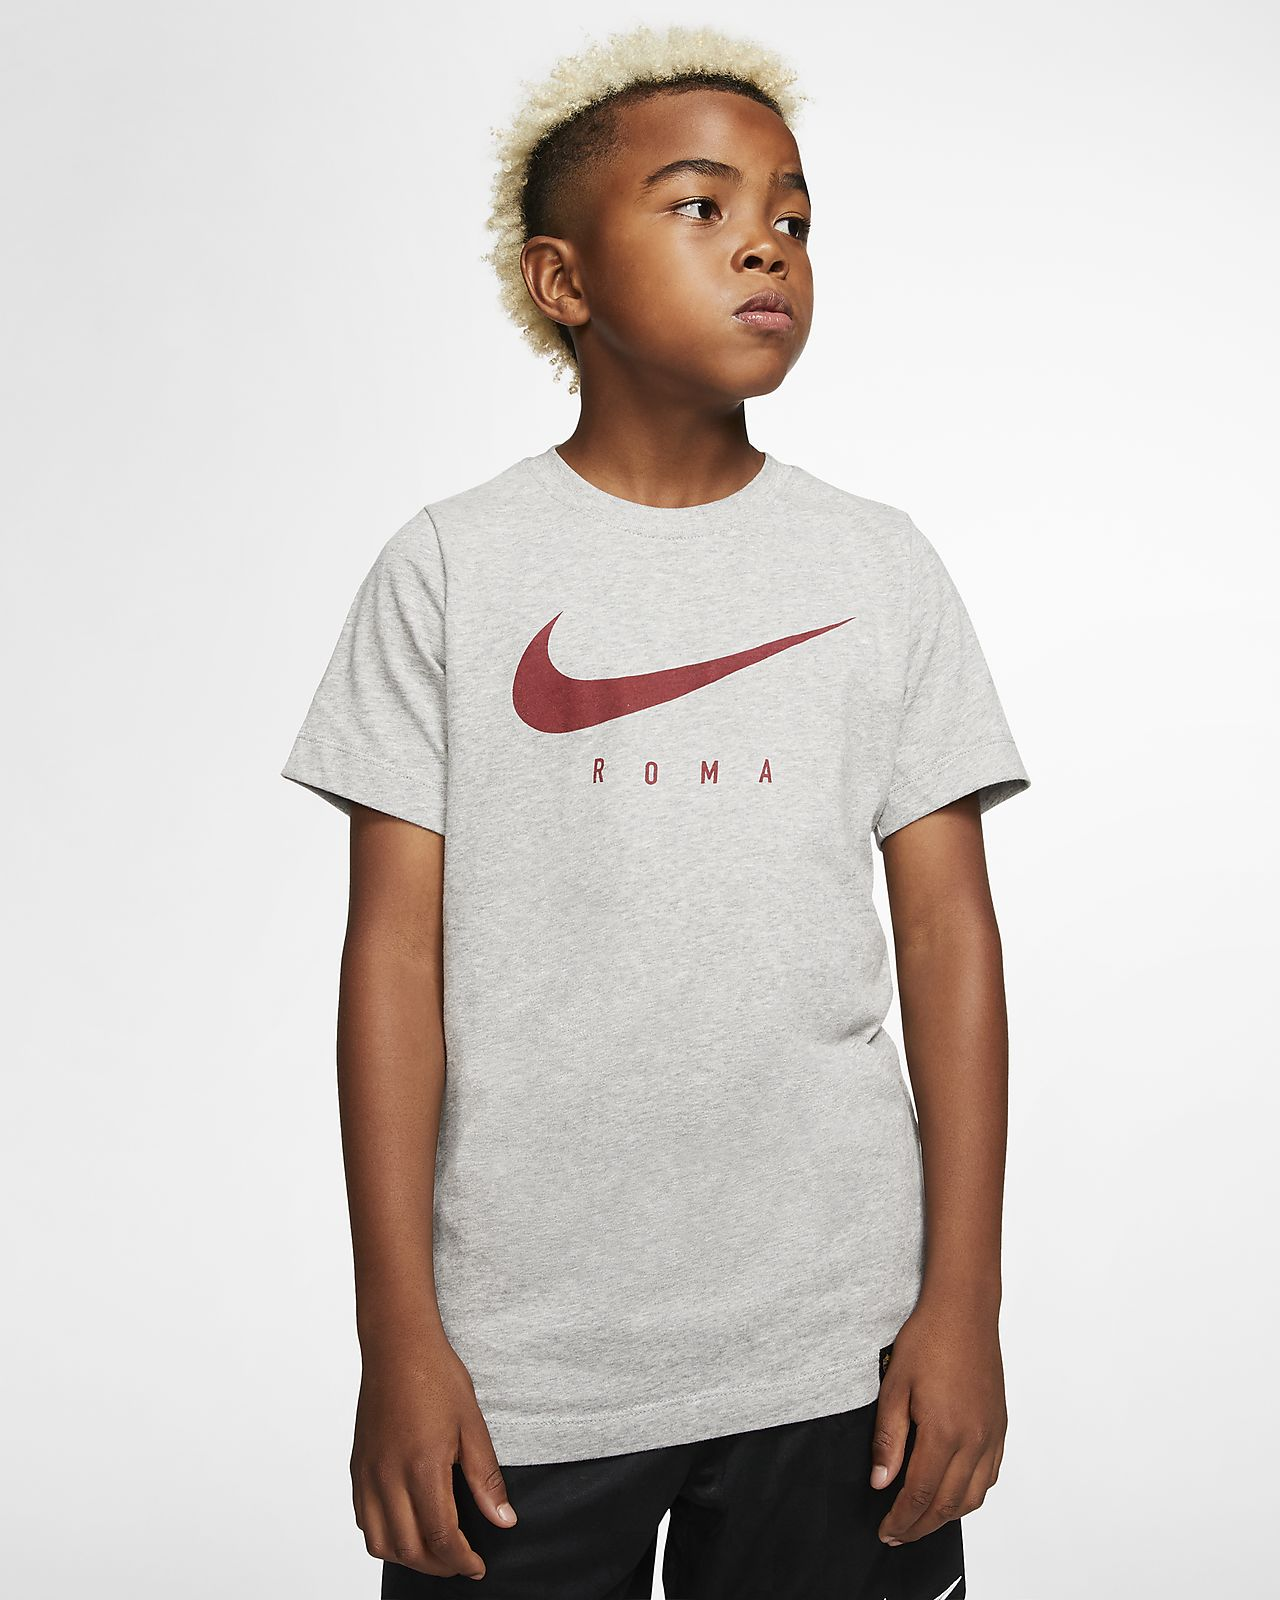 Playera de fútbol Nike Dri-FIT A.S. Roma para niños talla grande